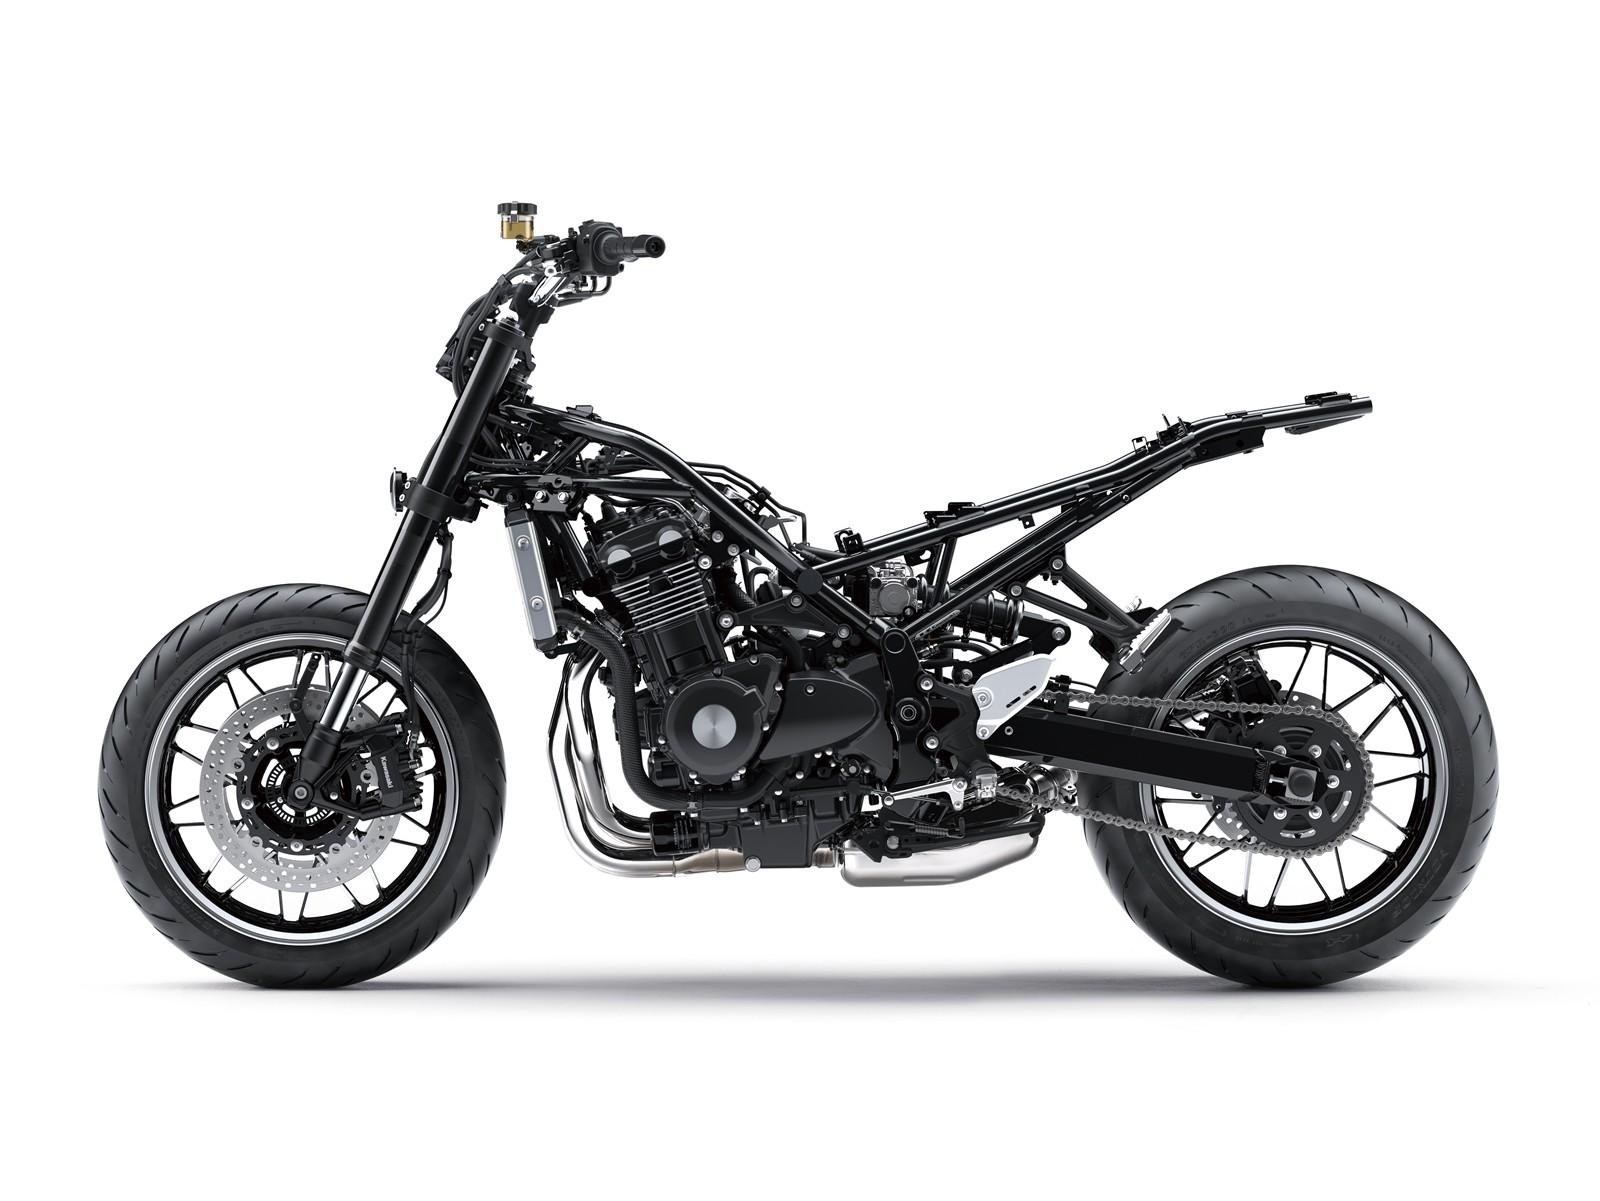 Kawasaki Z900rs Oferta Dm 13